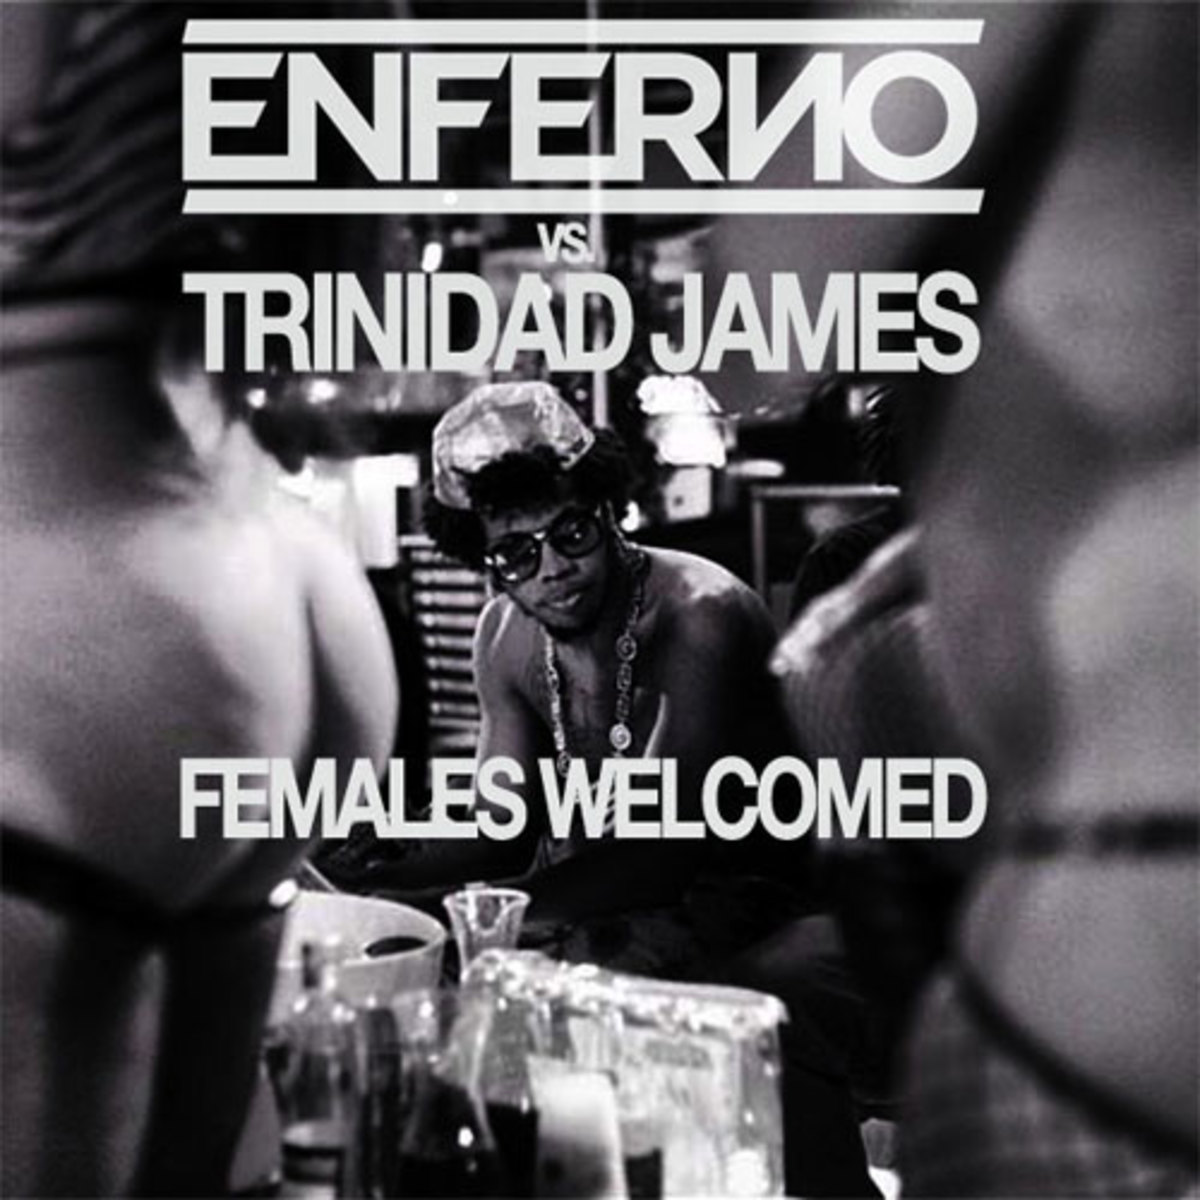 enfernotrinidad-femaleswelcomedrmx.jpg